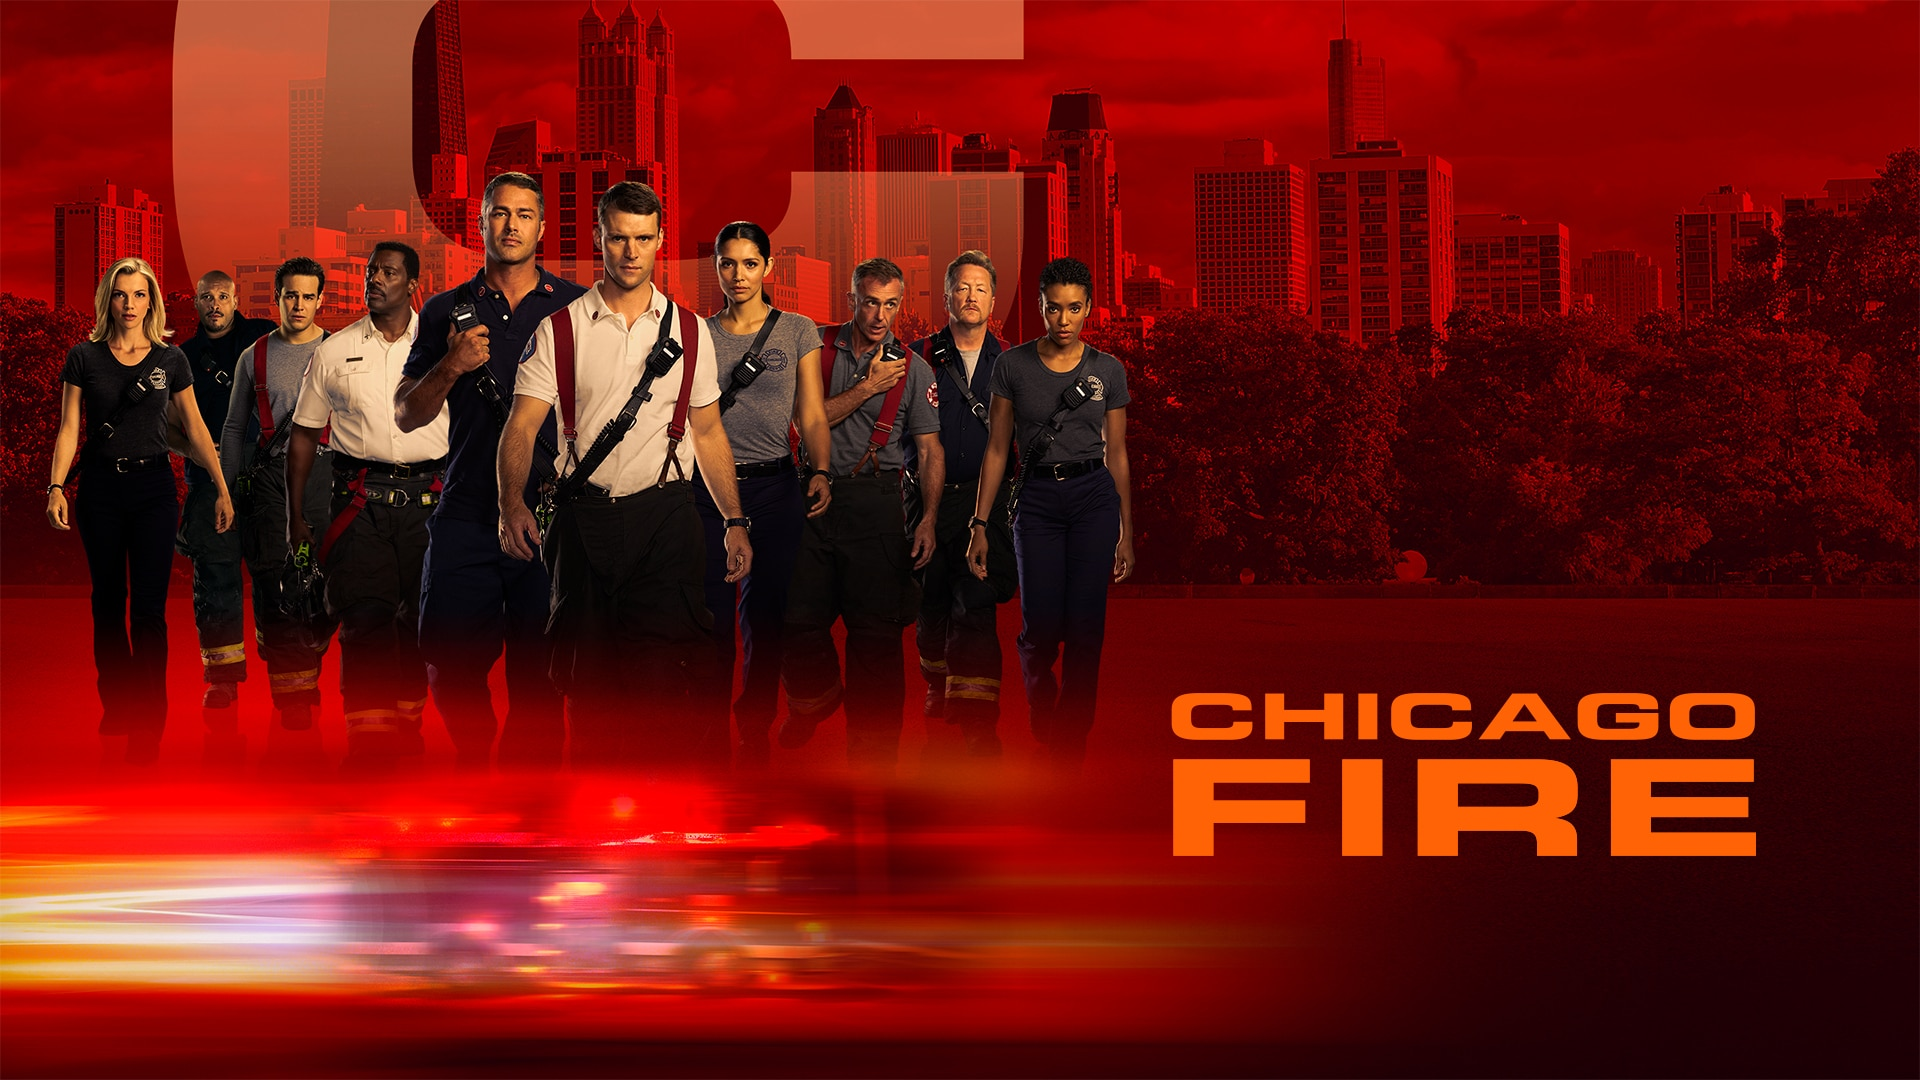 watch chicago fire season 6 online free